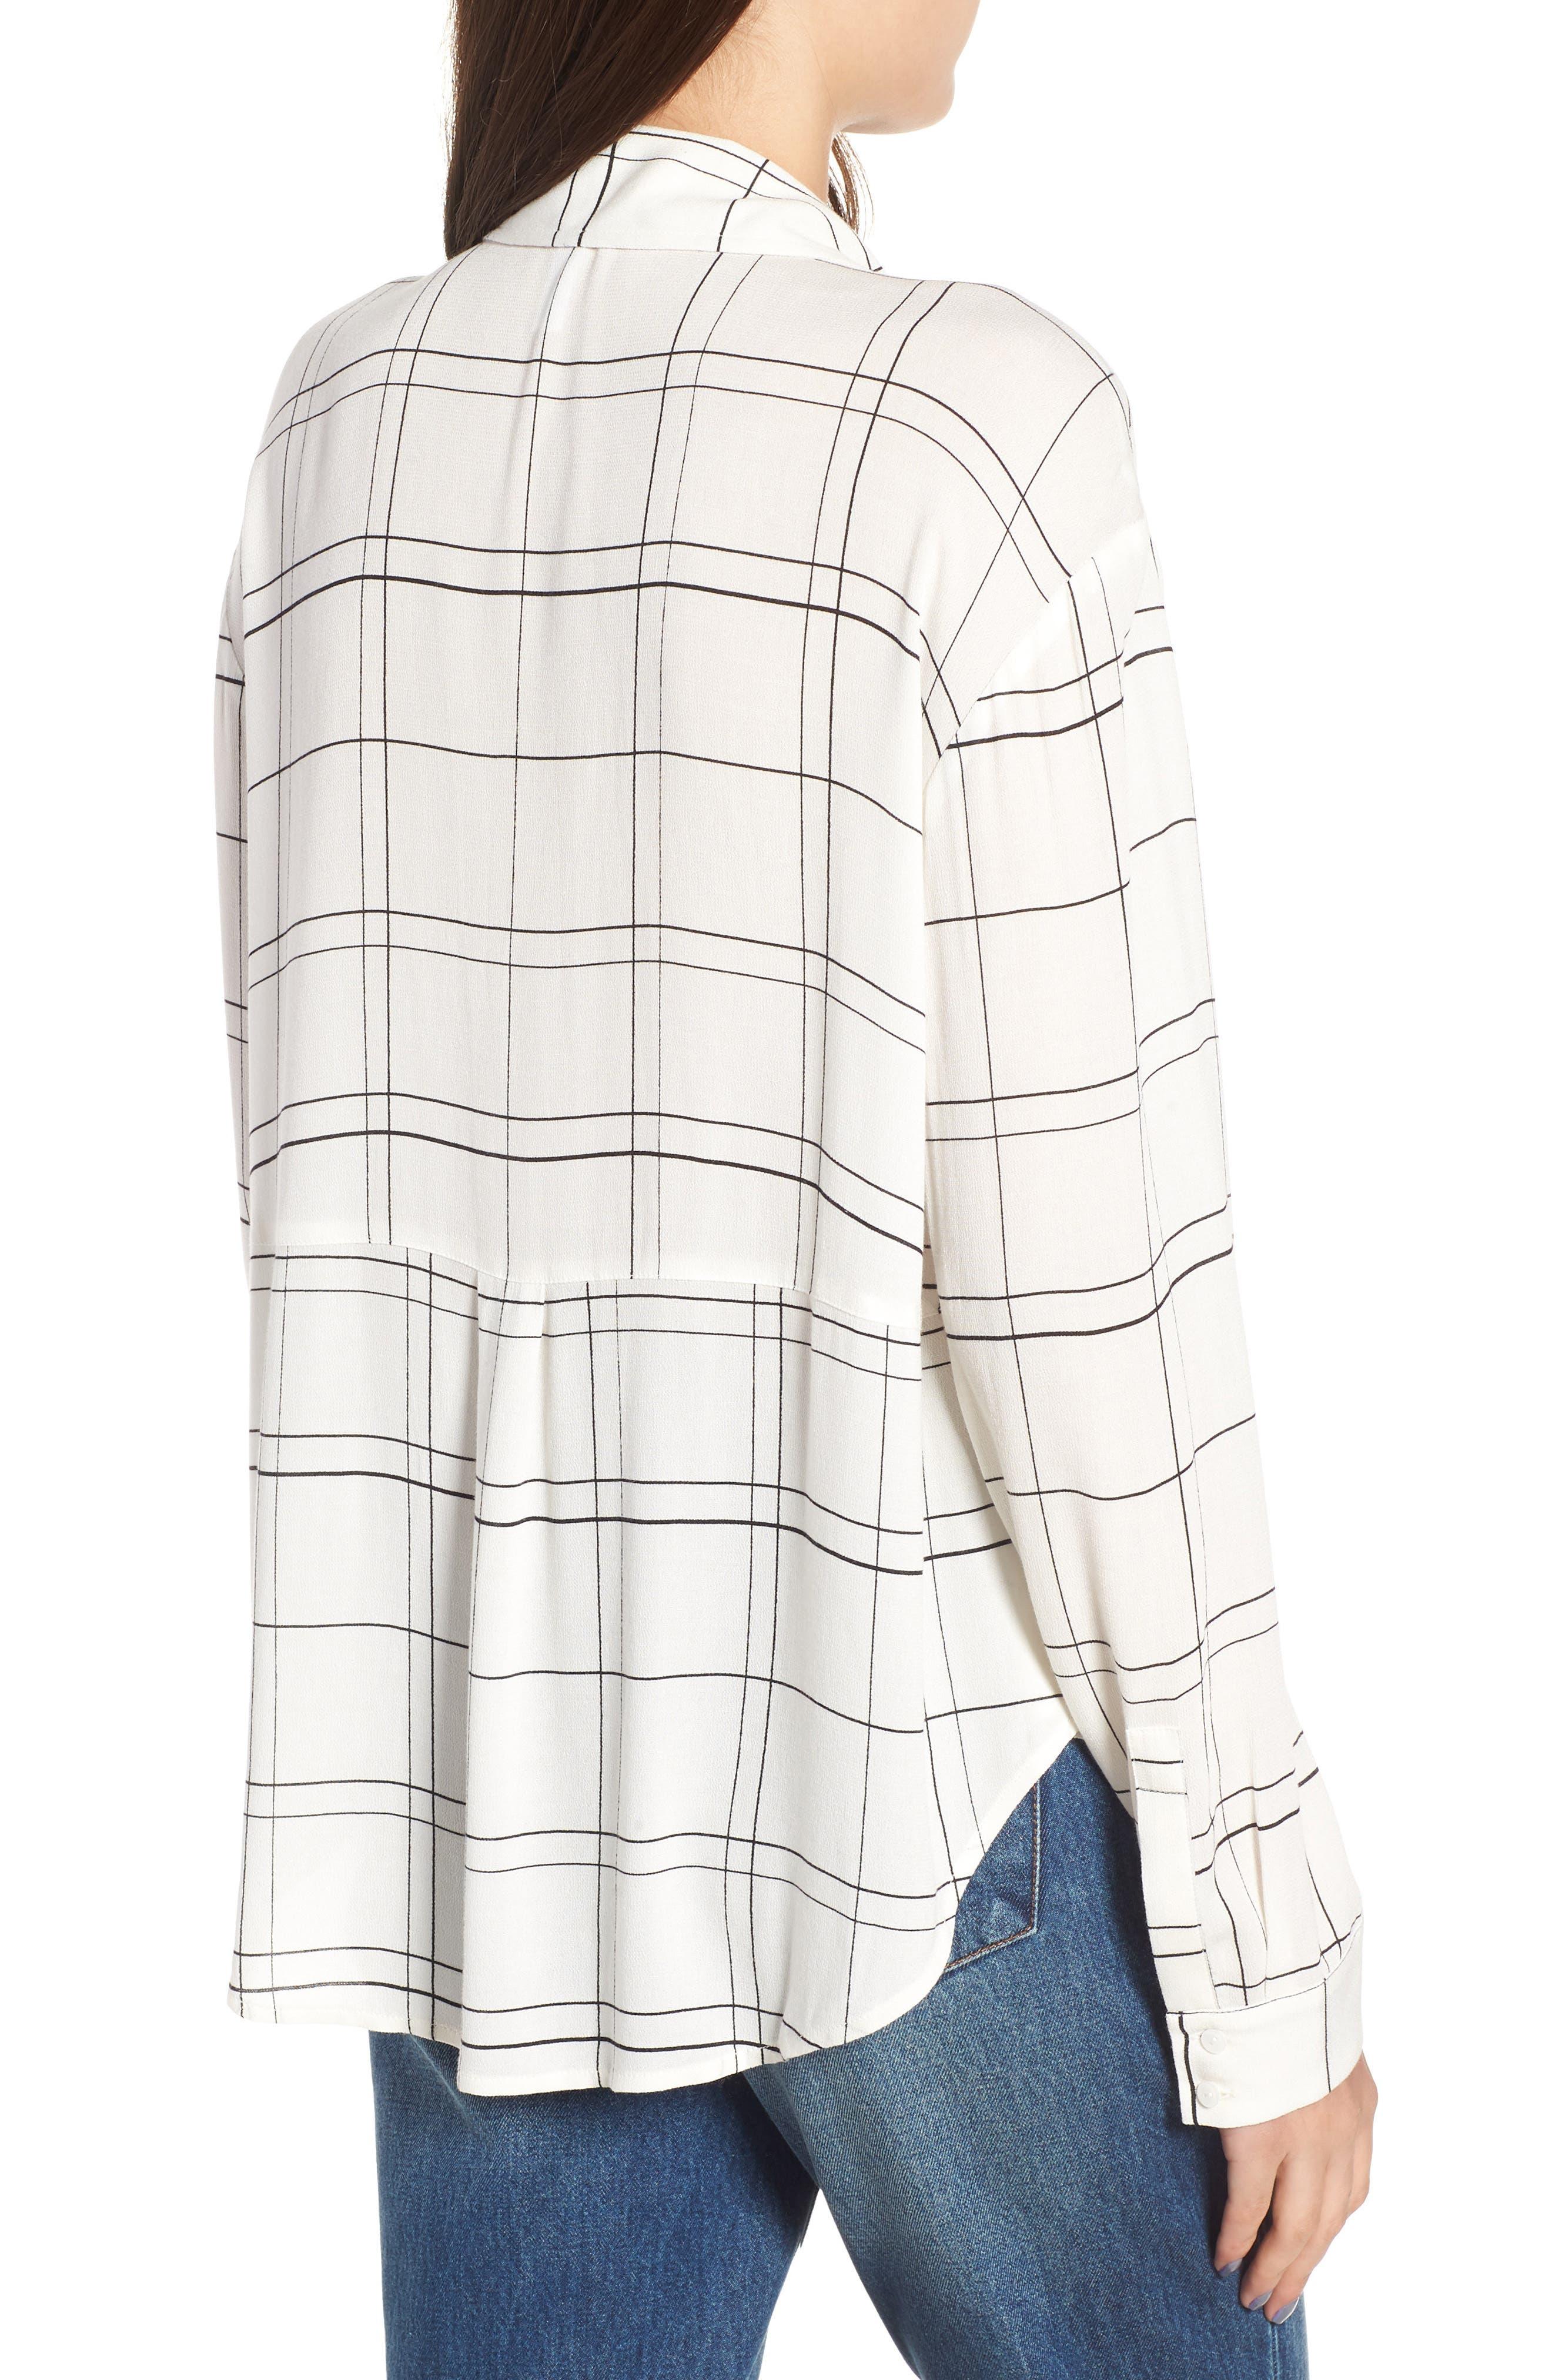 Henley Woven Shirt,                             Alternate thumbnail 2, color,                             Ivory Glam City Check